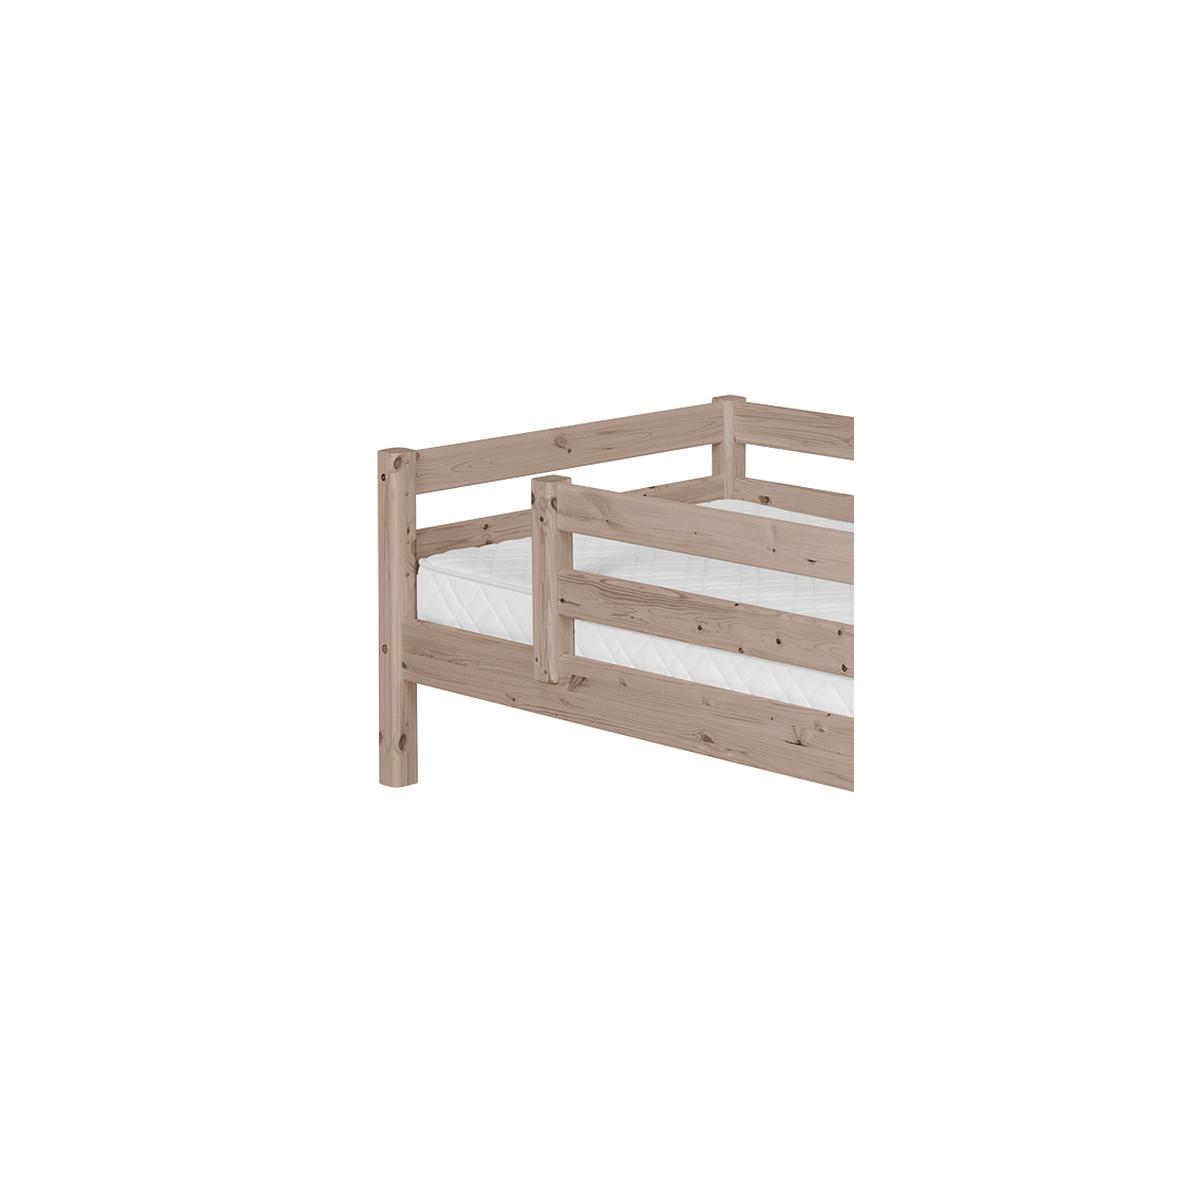 Cama individual barrera 1/2 90x190 CLASSIC Flexa terra